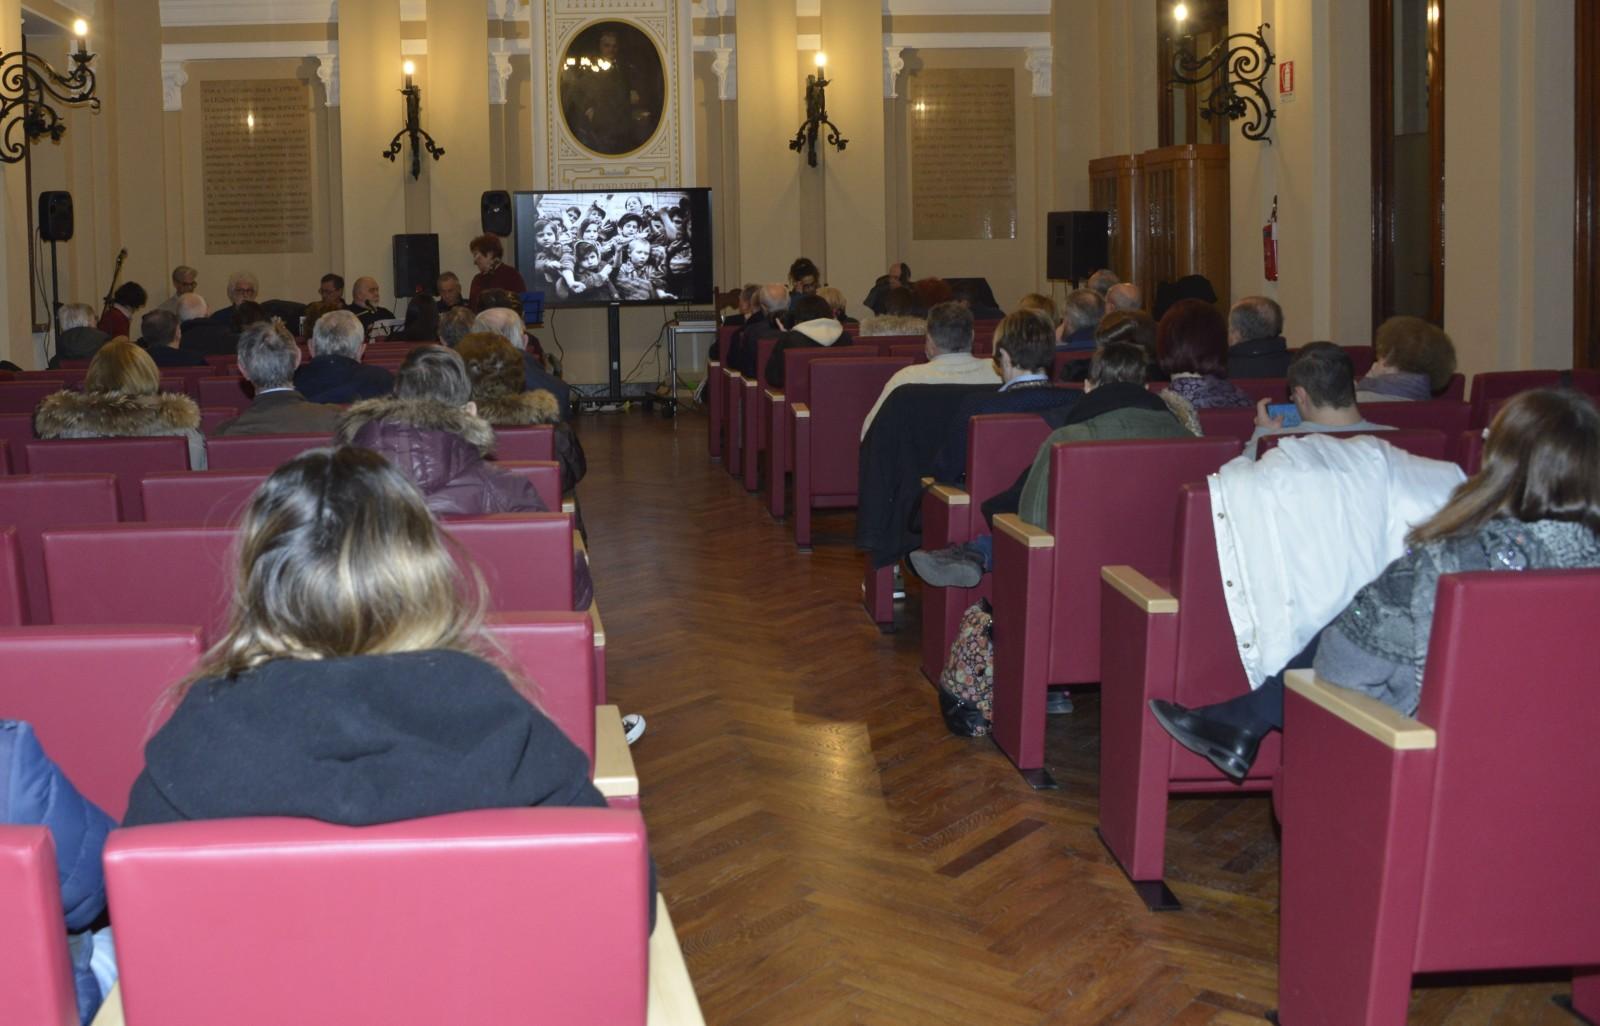 Conferenza Prof Restelli -25 1 19- Bernocchi (7)